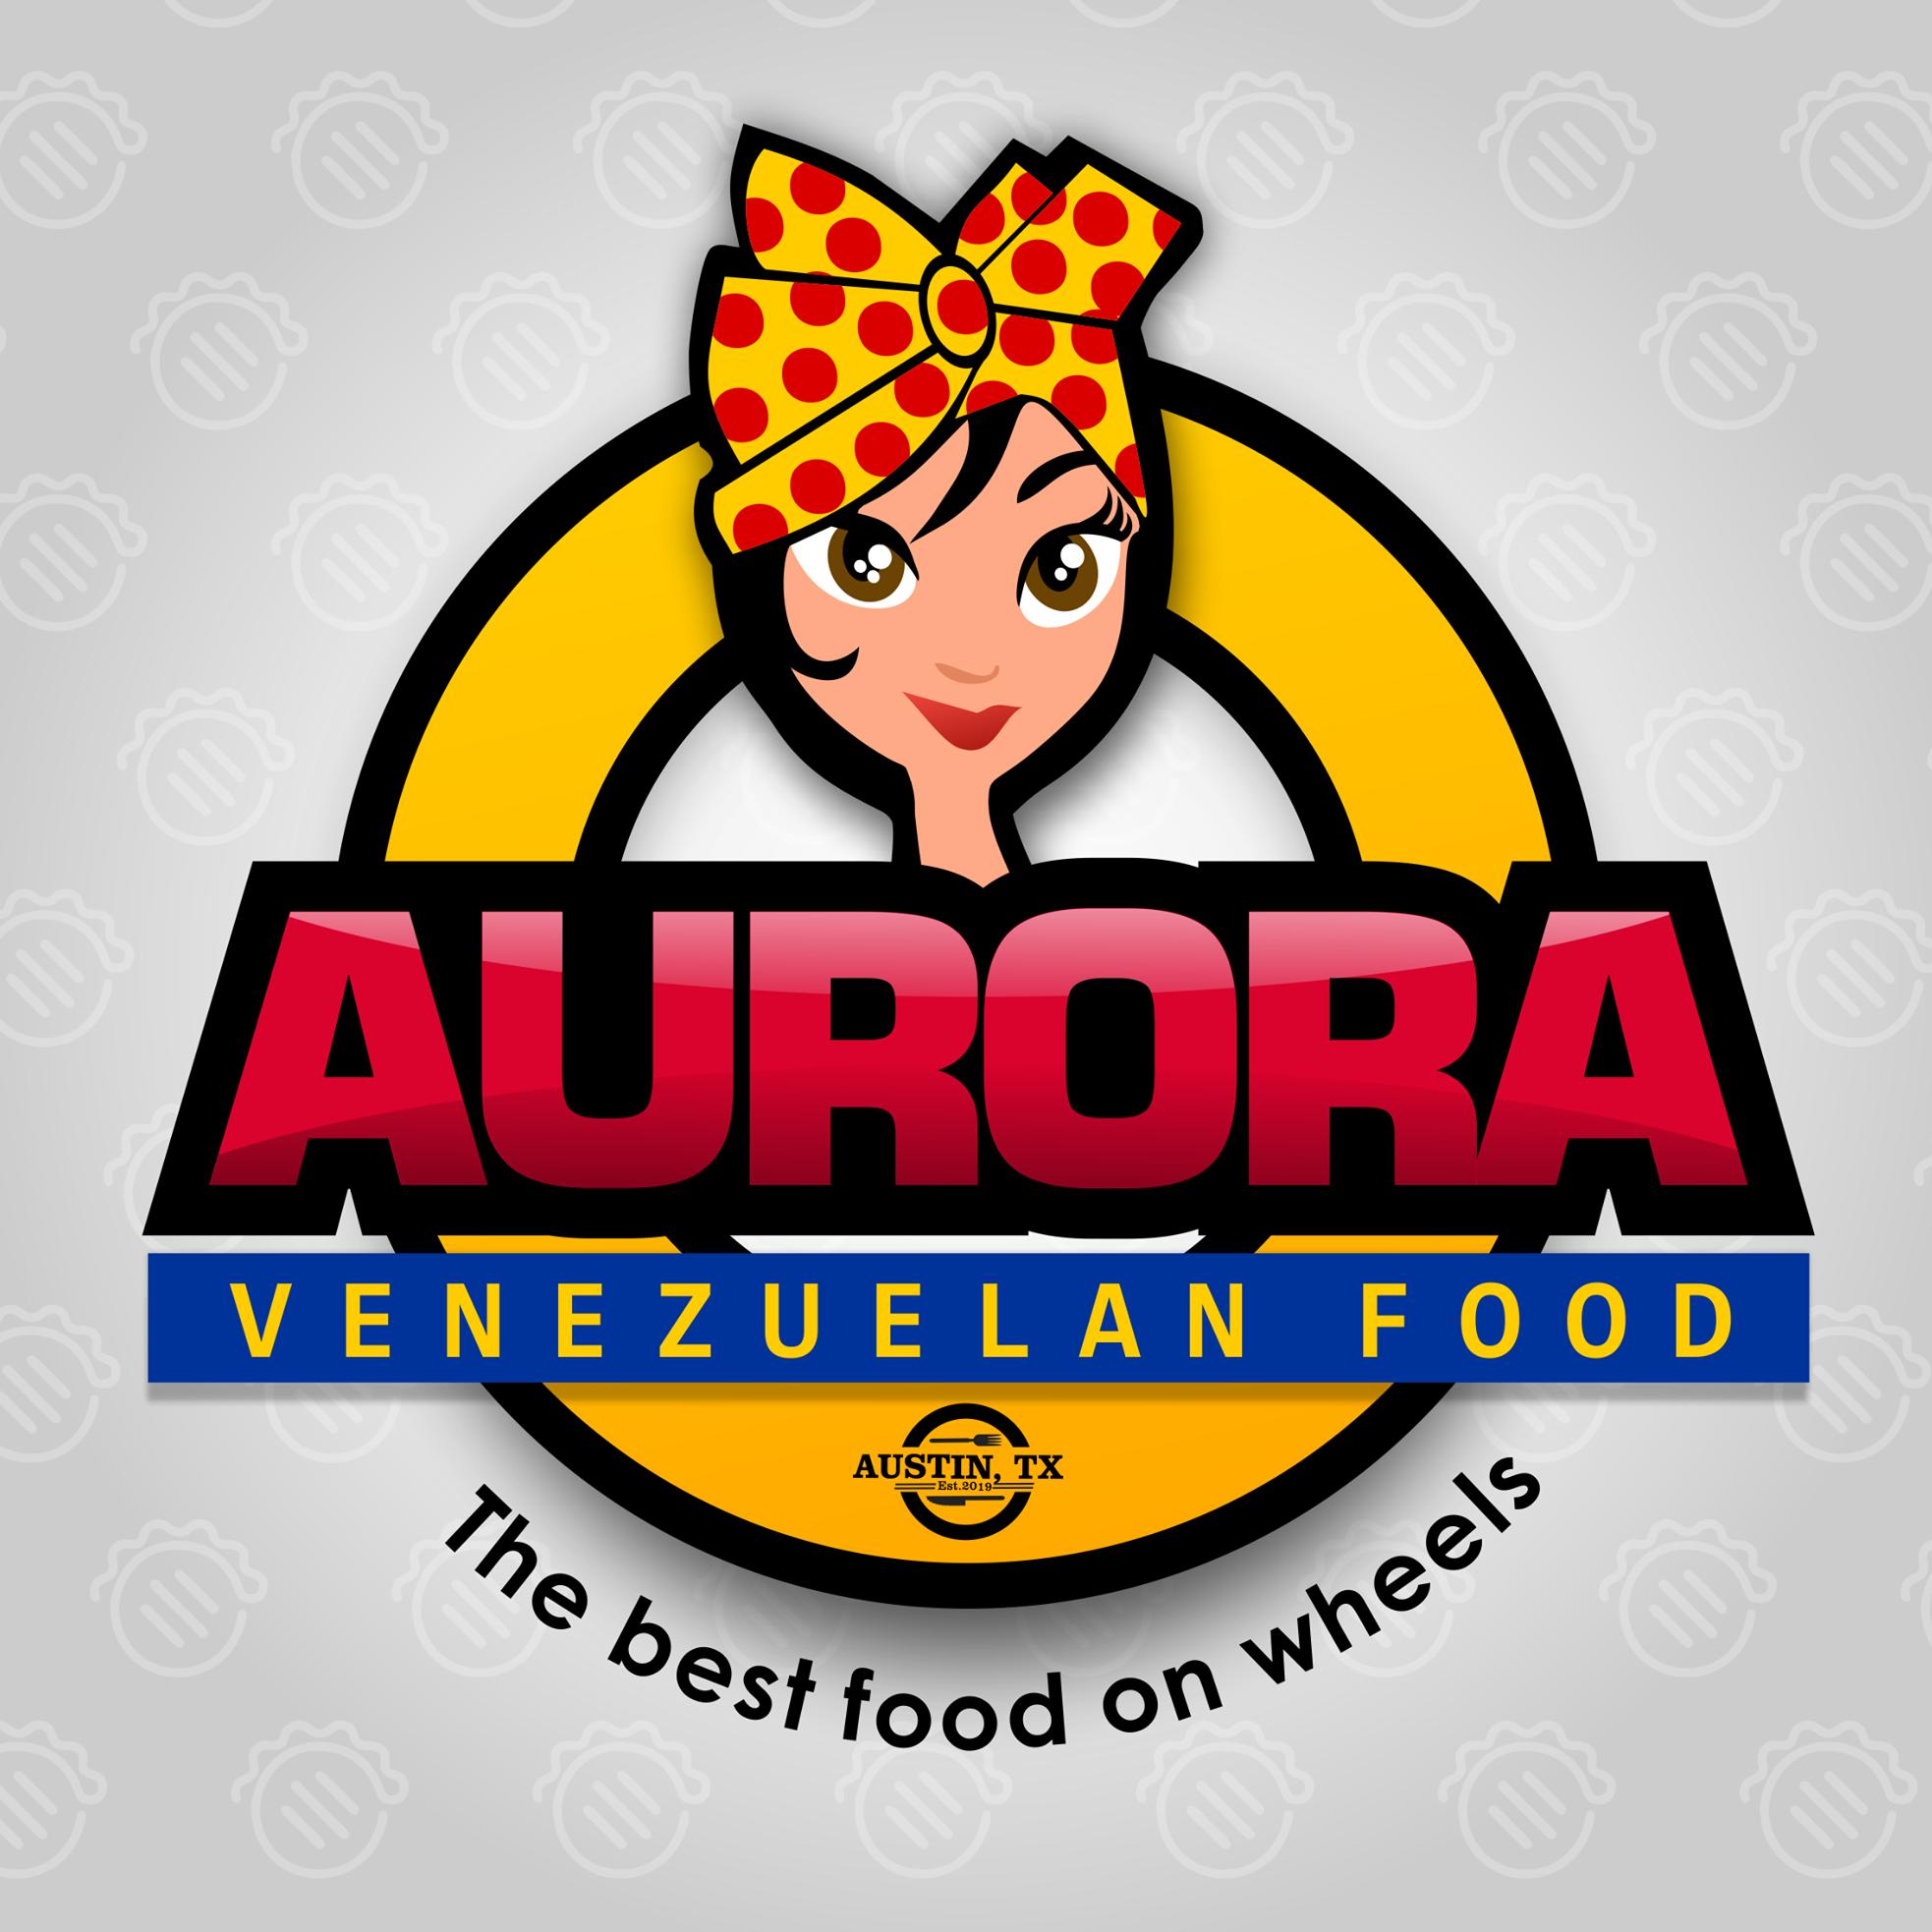 Aurora Venezuelan Food logo